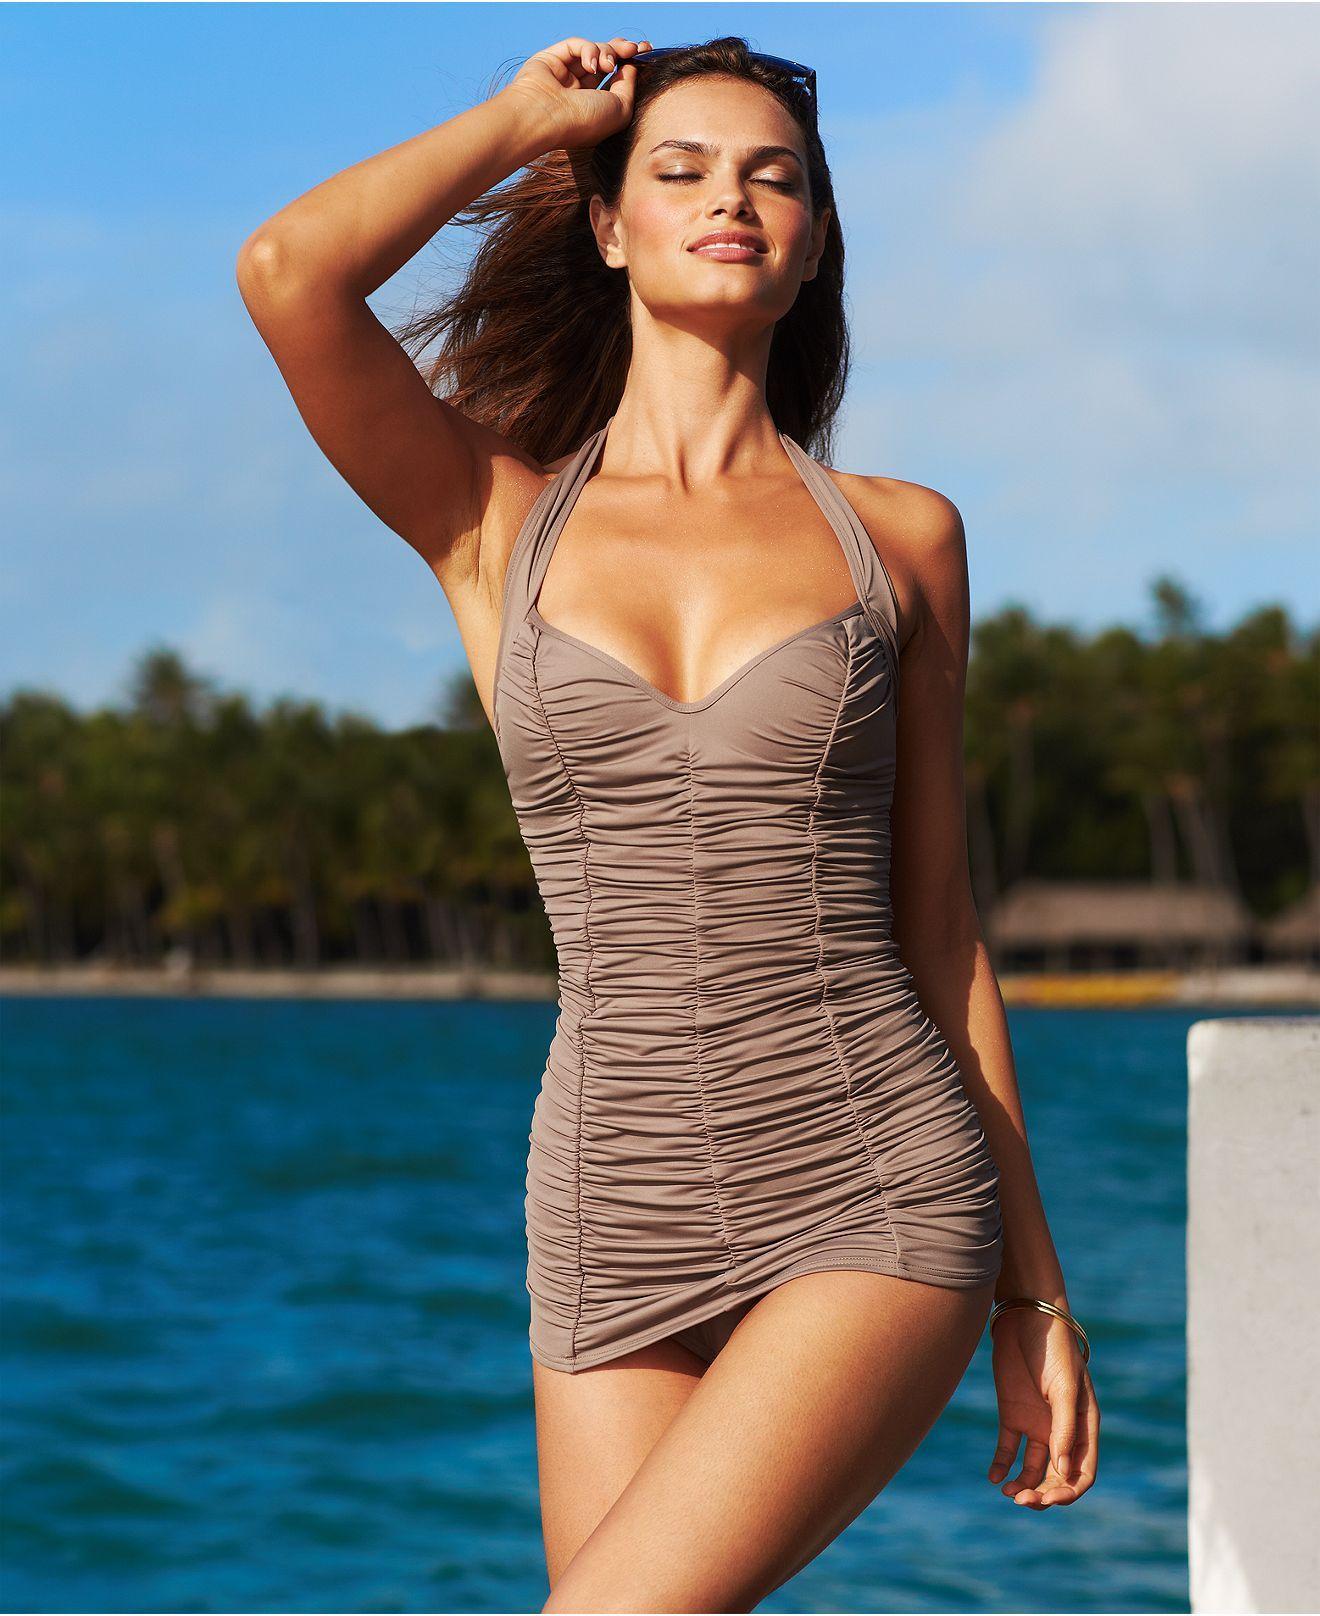 e56849c0cd276 DKNY Swimsuit, Halter Shirred Swimdress - Womens Swimwear - Macys ...